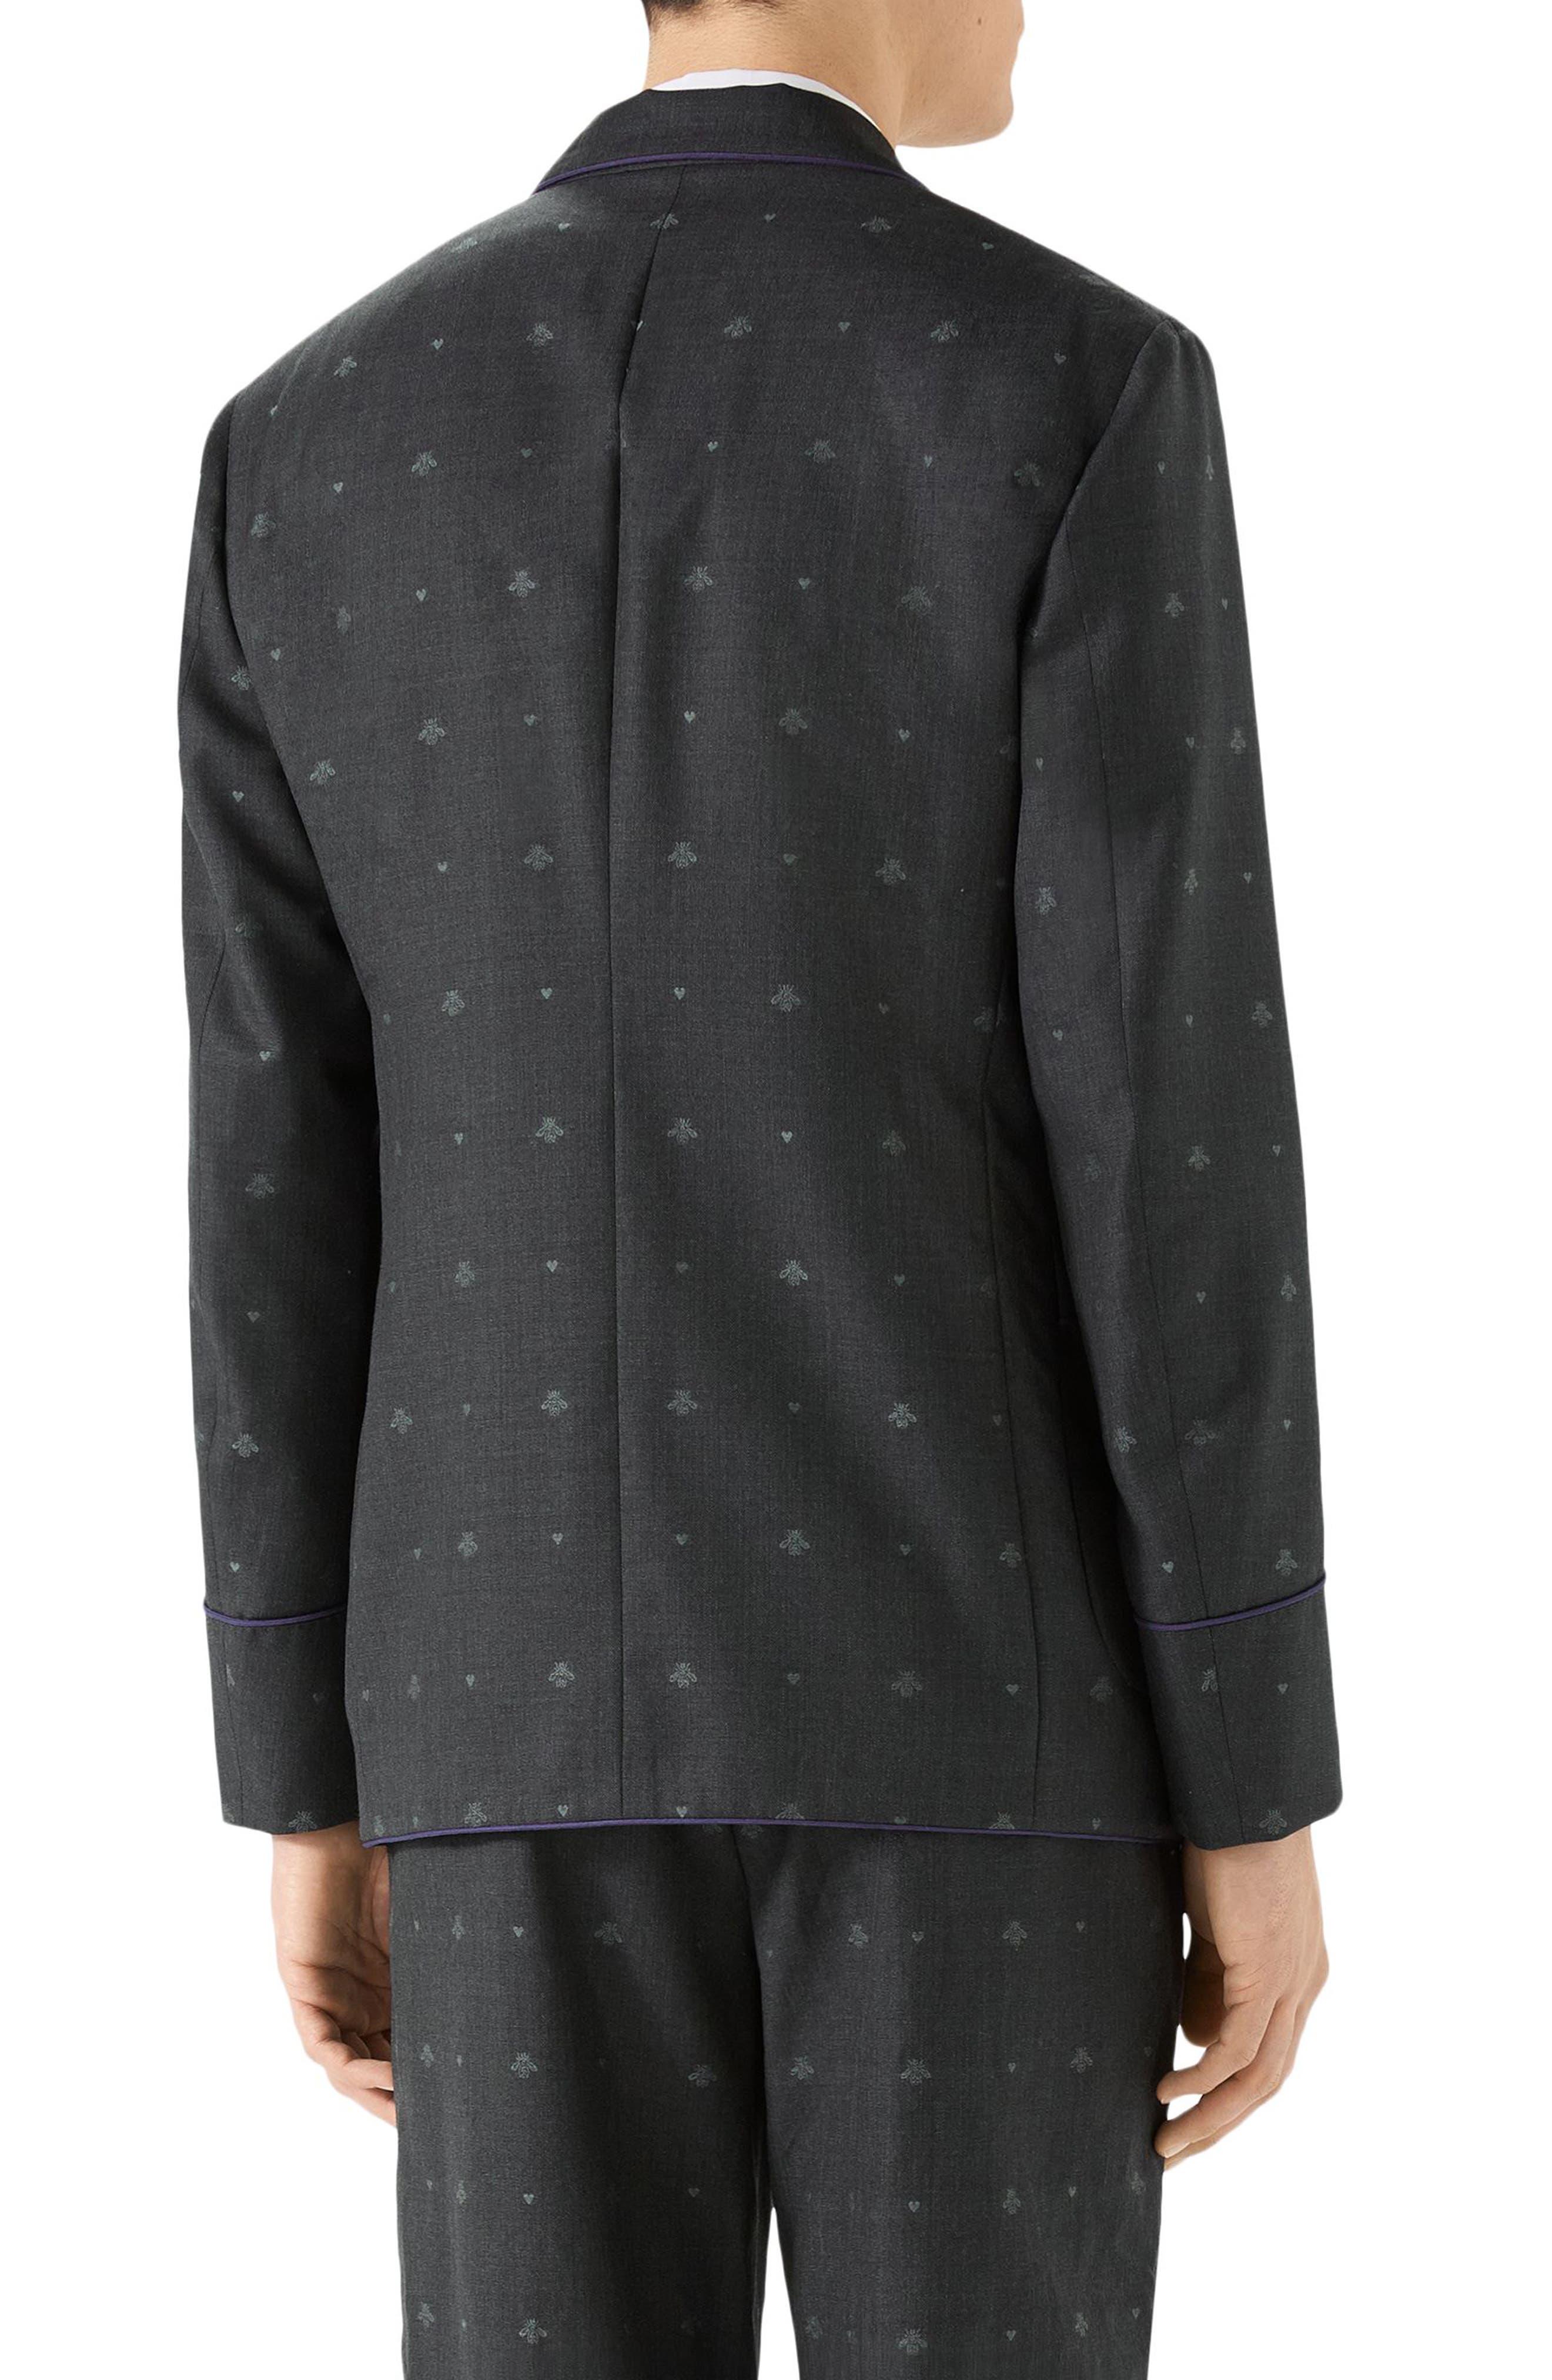 Bee & Heart Print Wool Sport Coat,                             Alternate thumbnail 2, color,                             Dark Grey